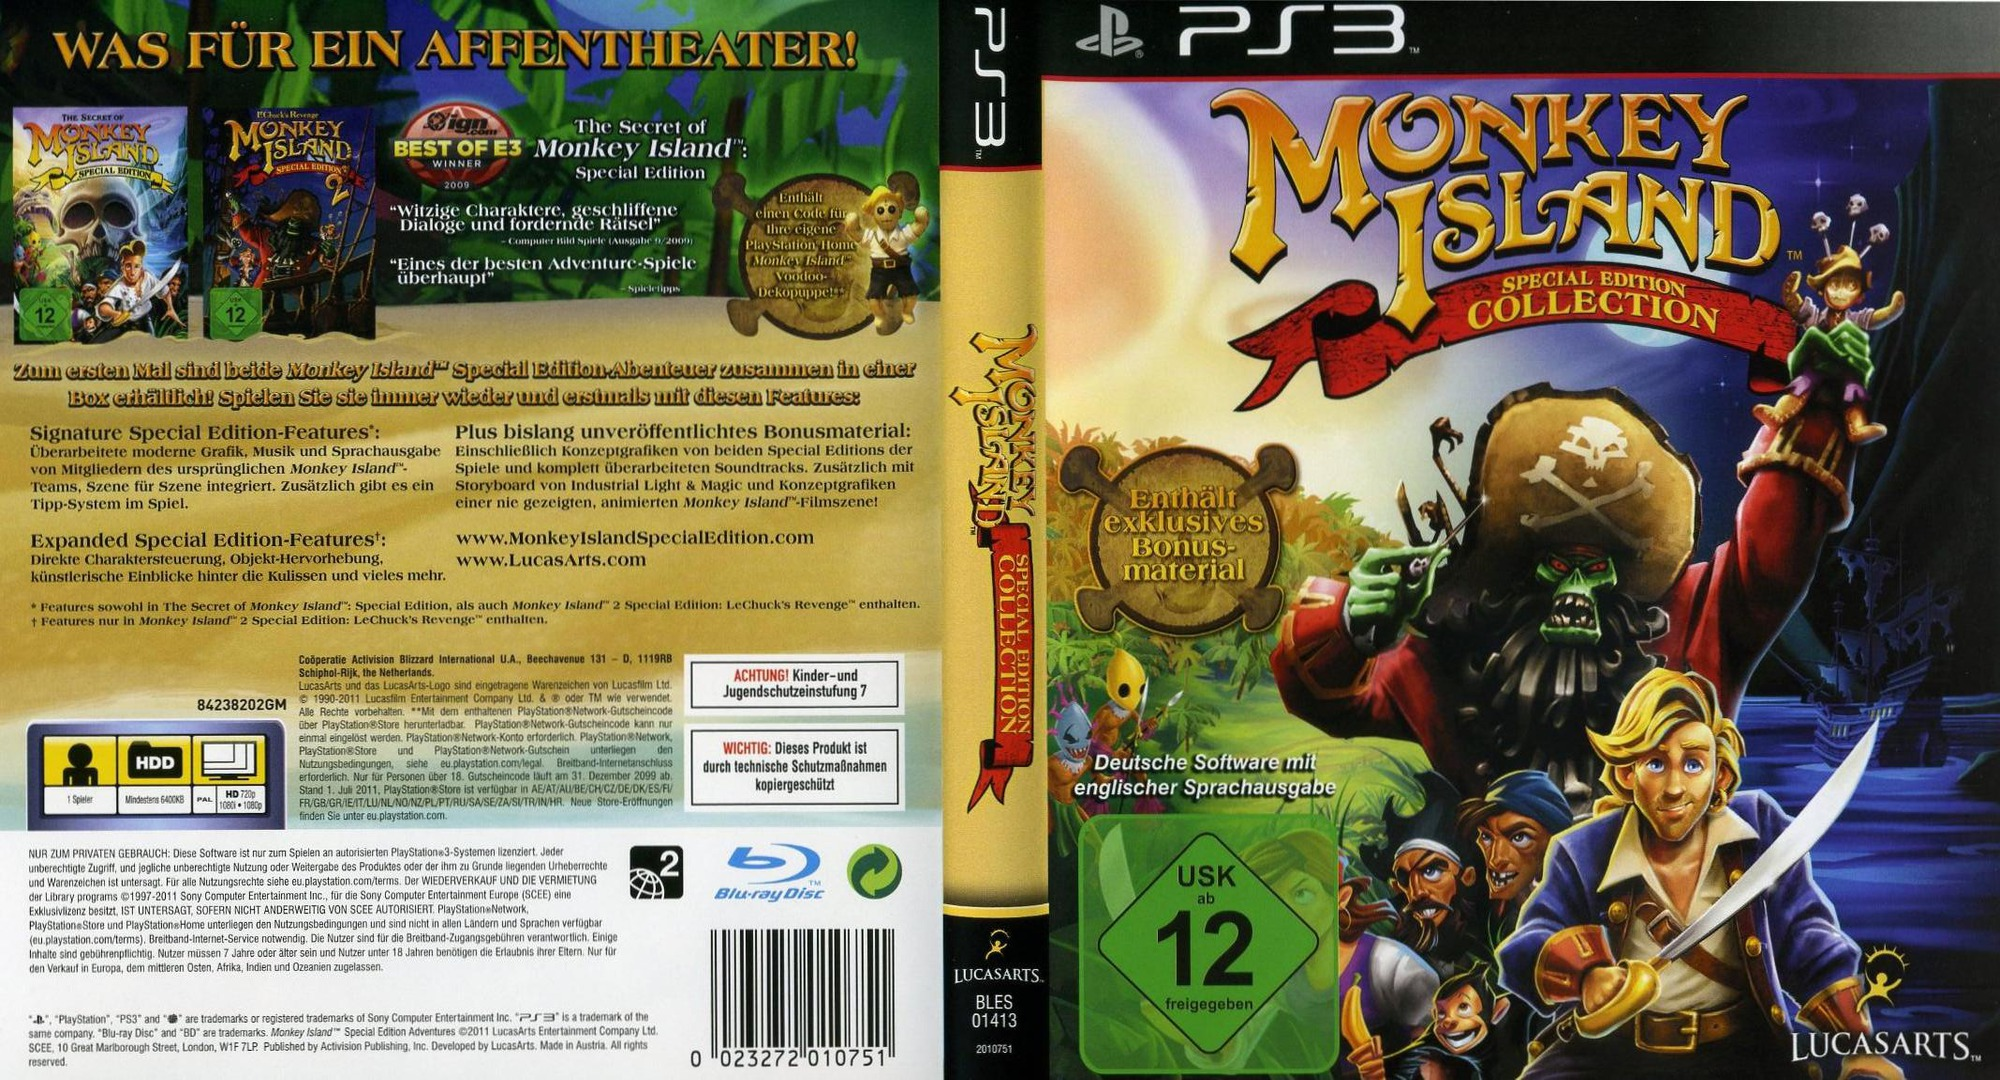 Monkey Island Title